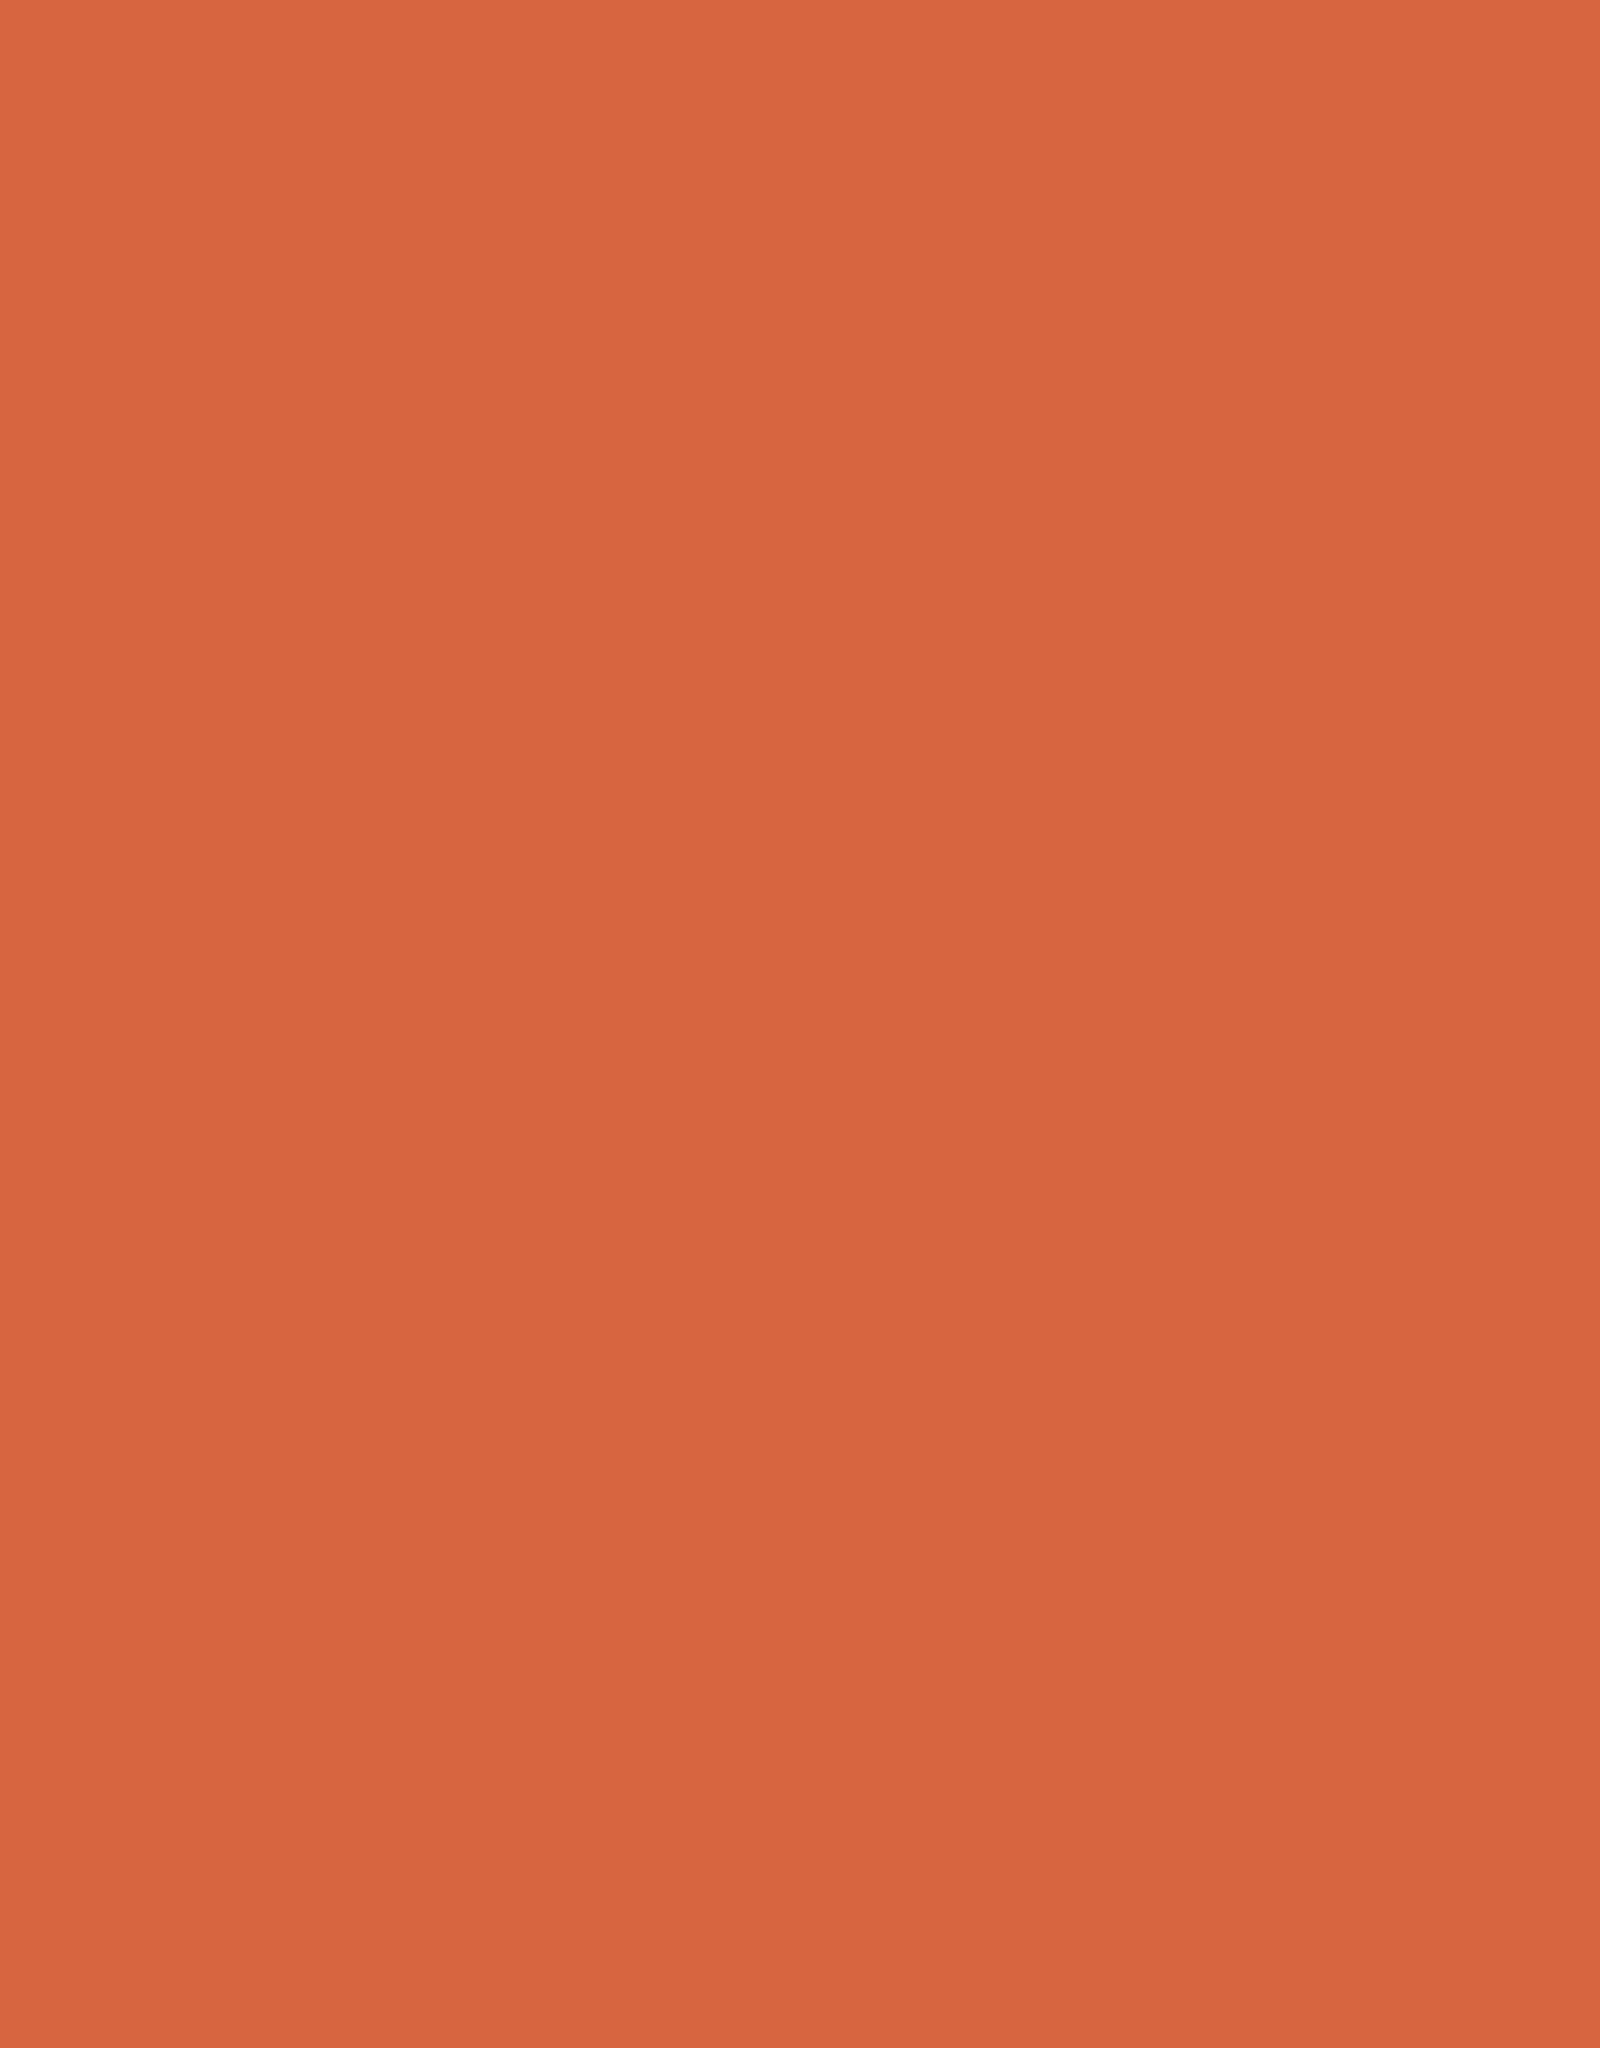 Superior Seamless Superior Seamless 9' Orange #94